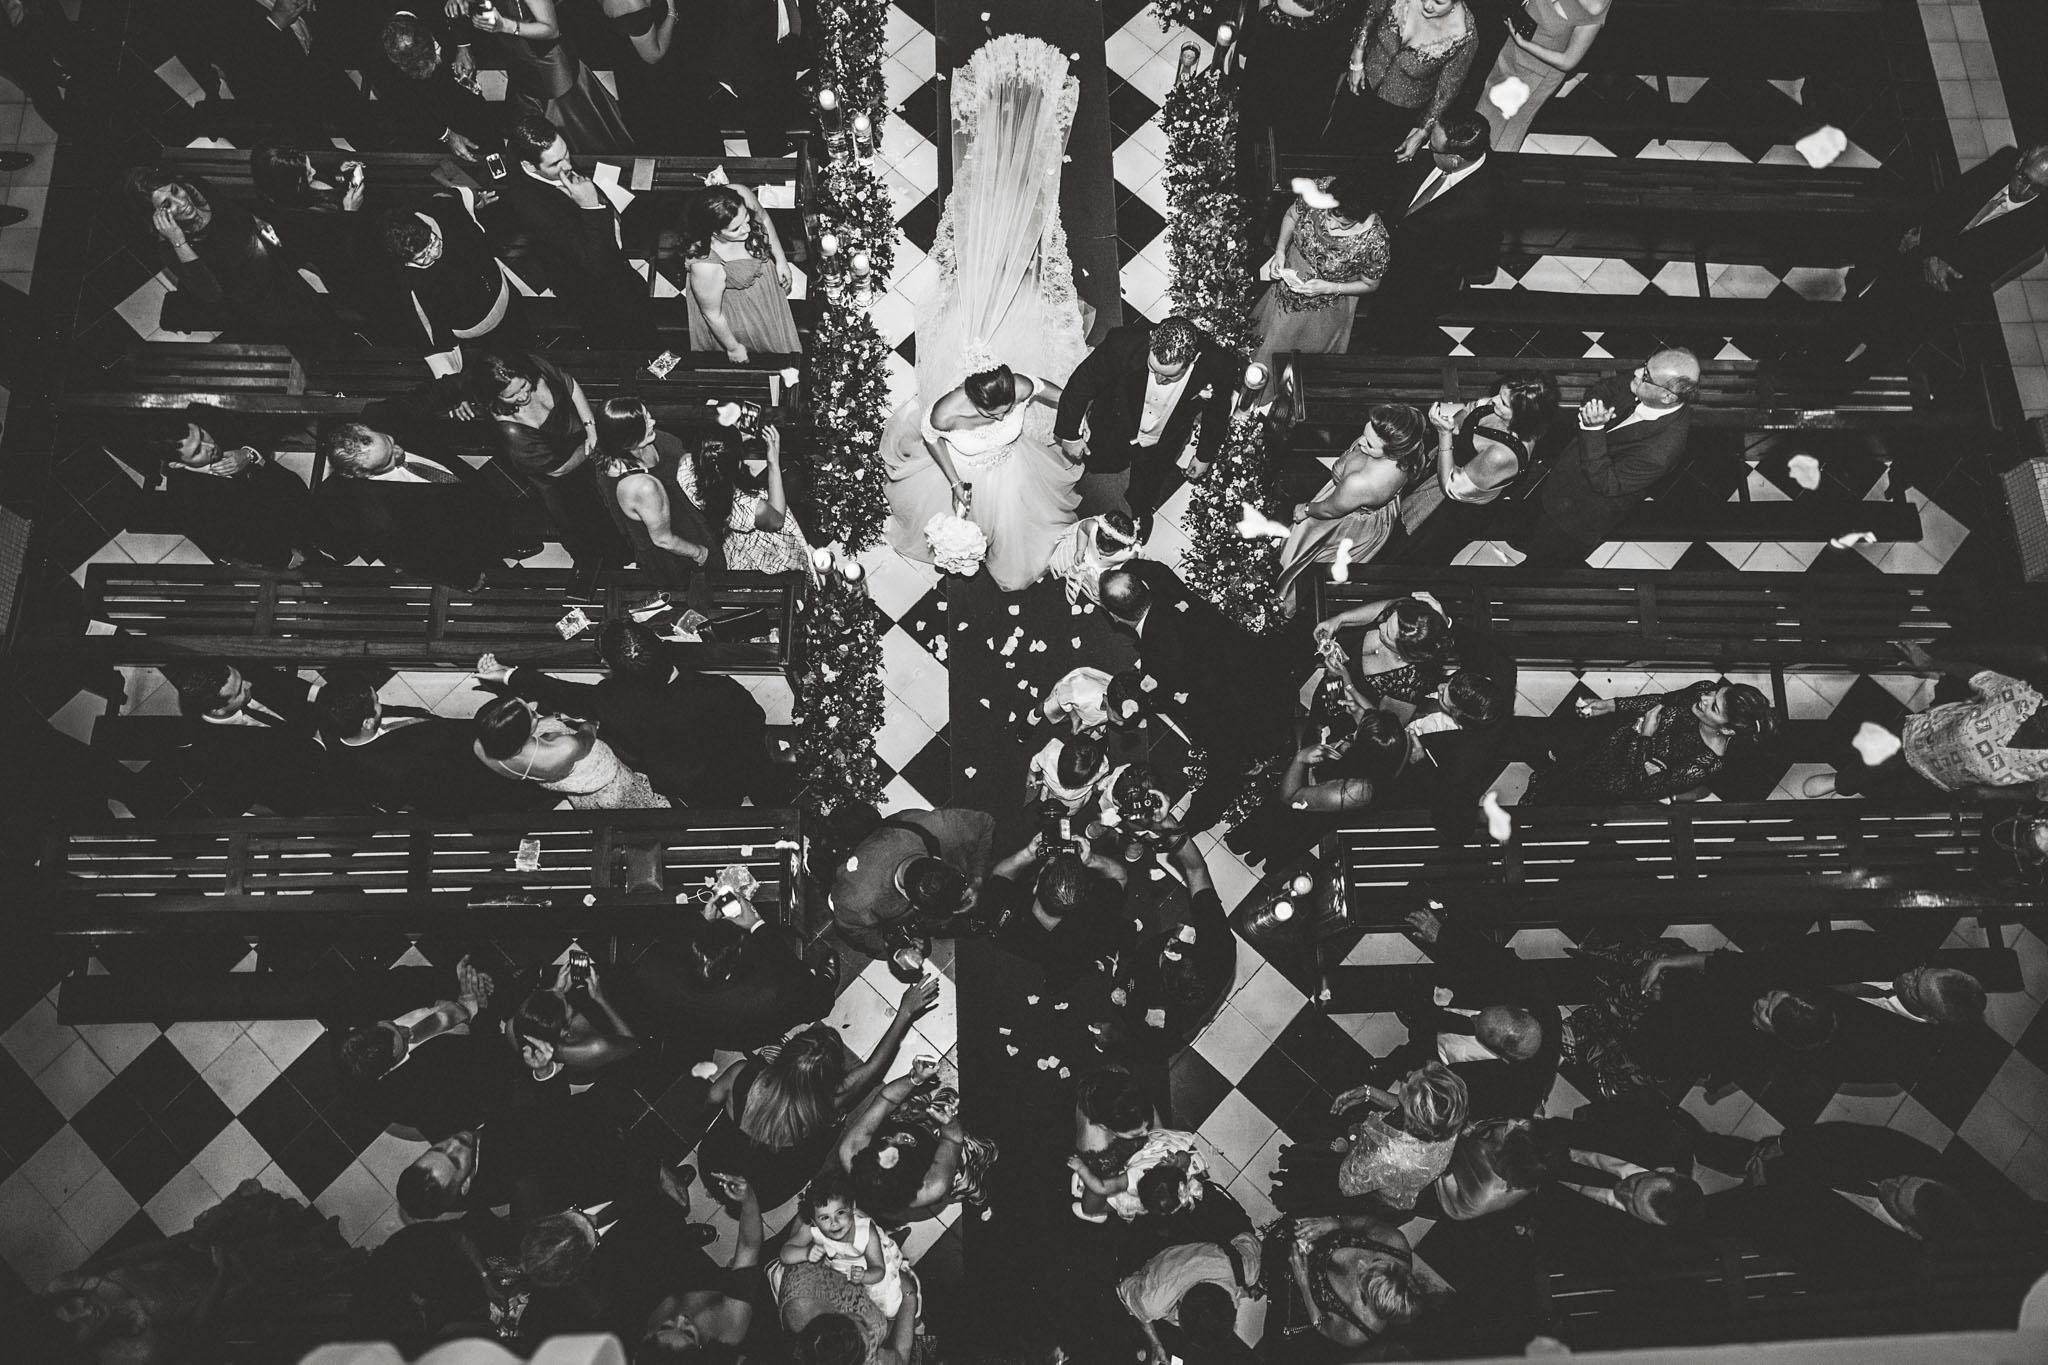 boda religiosa - precios & paquetes